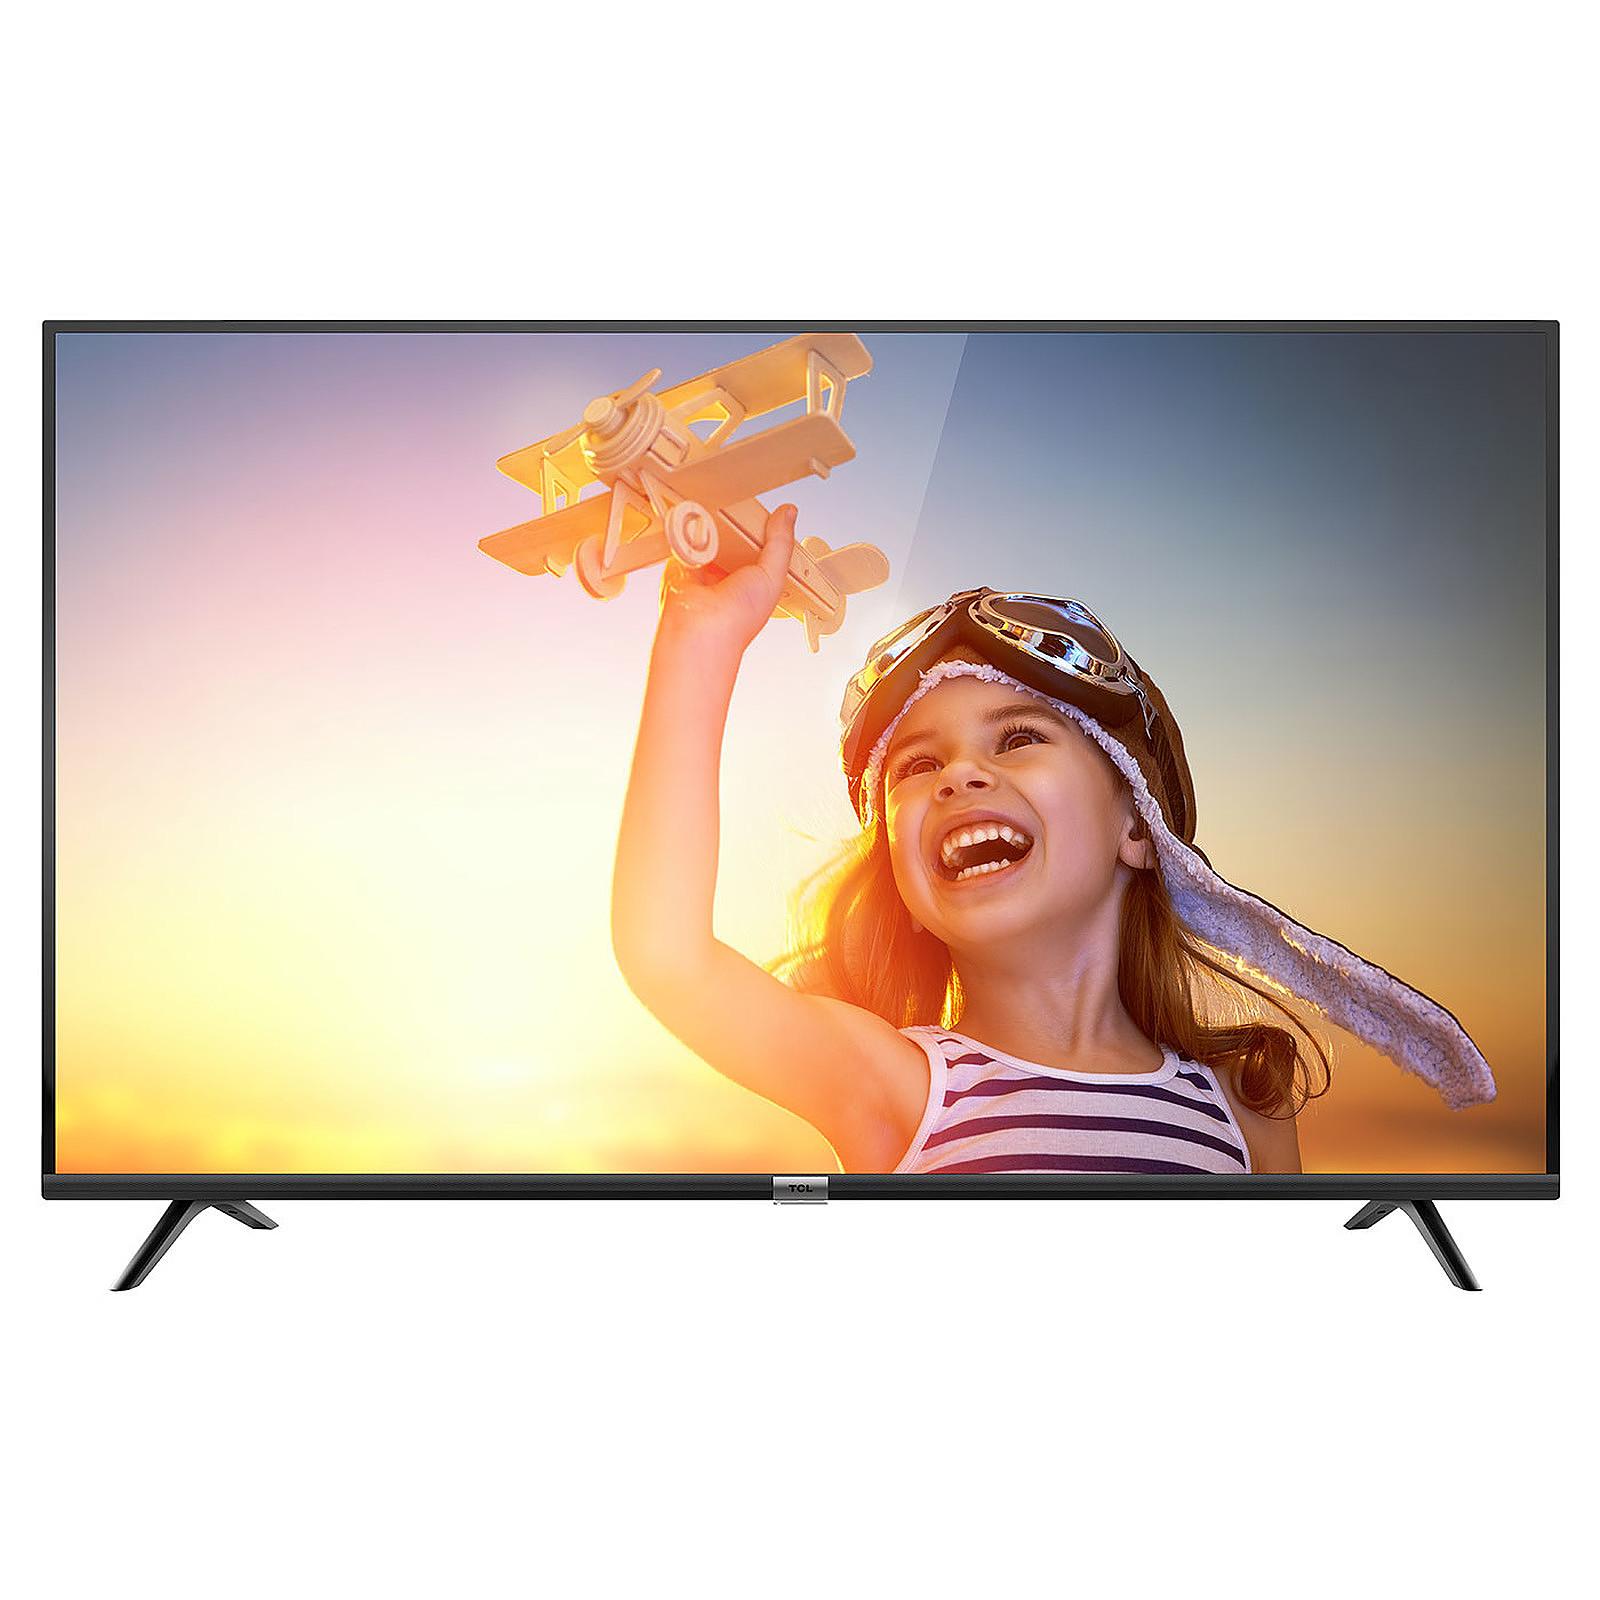 "TV 43"" TCL 43DP602 - 4K UHD, HDR10, Smart TV"